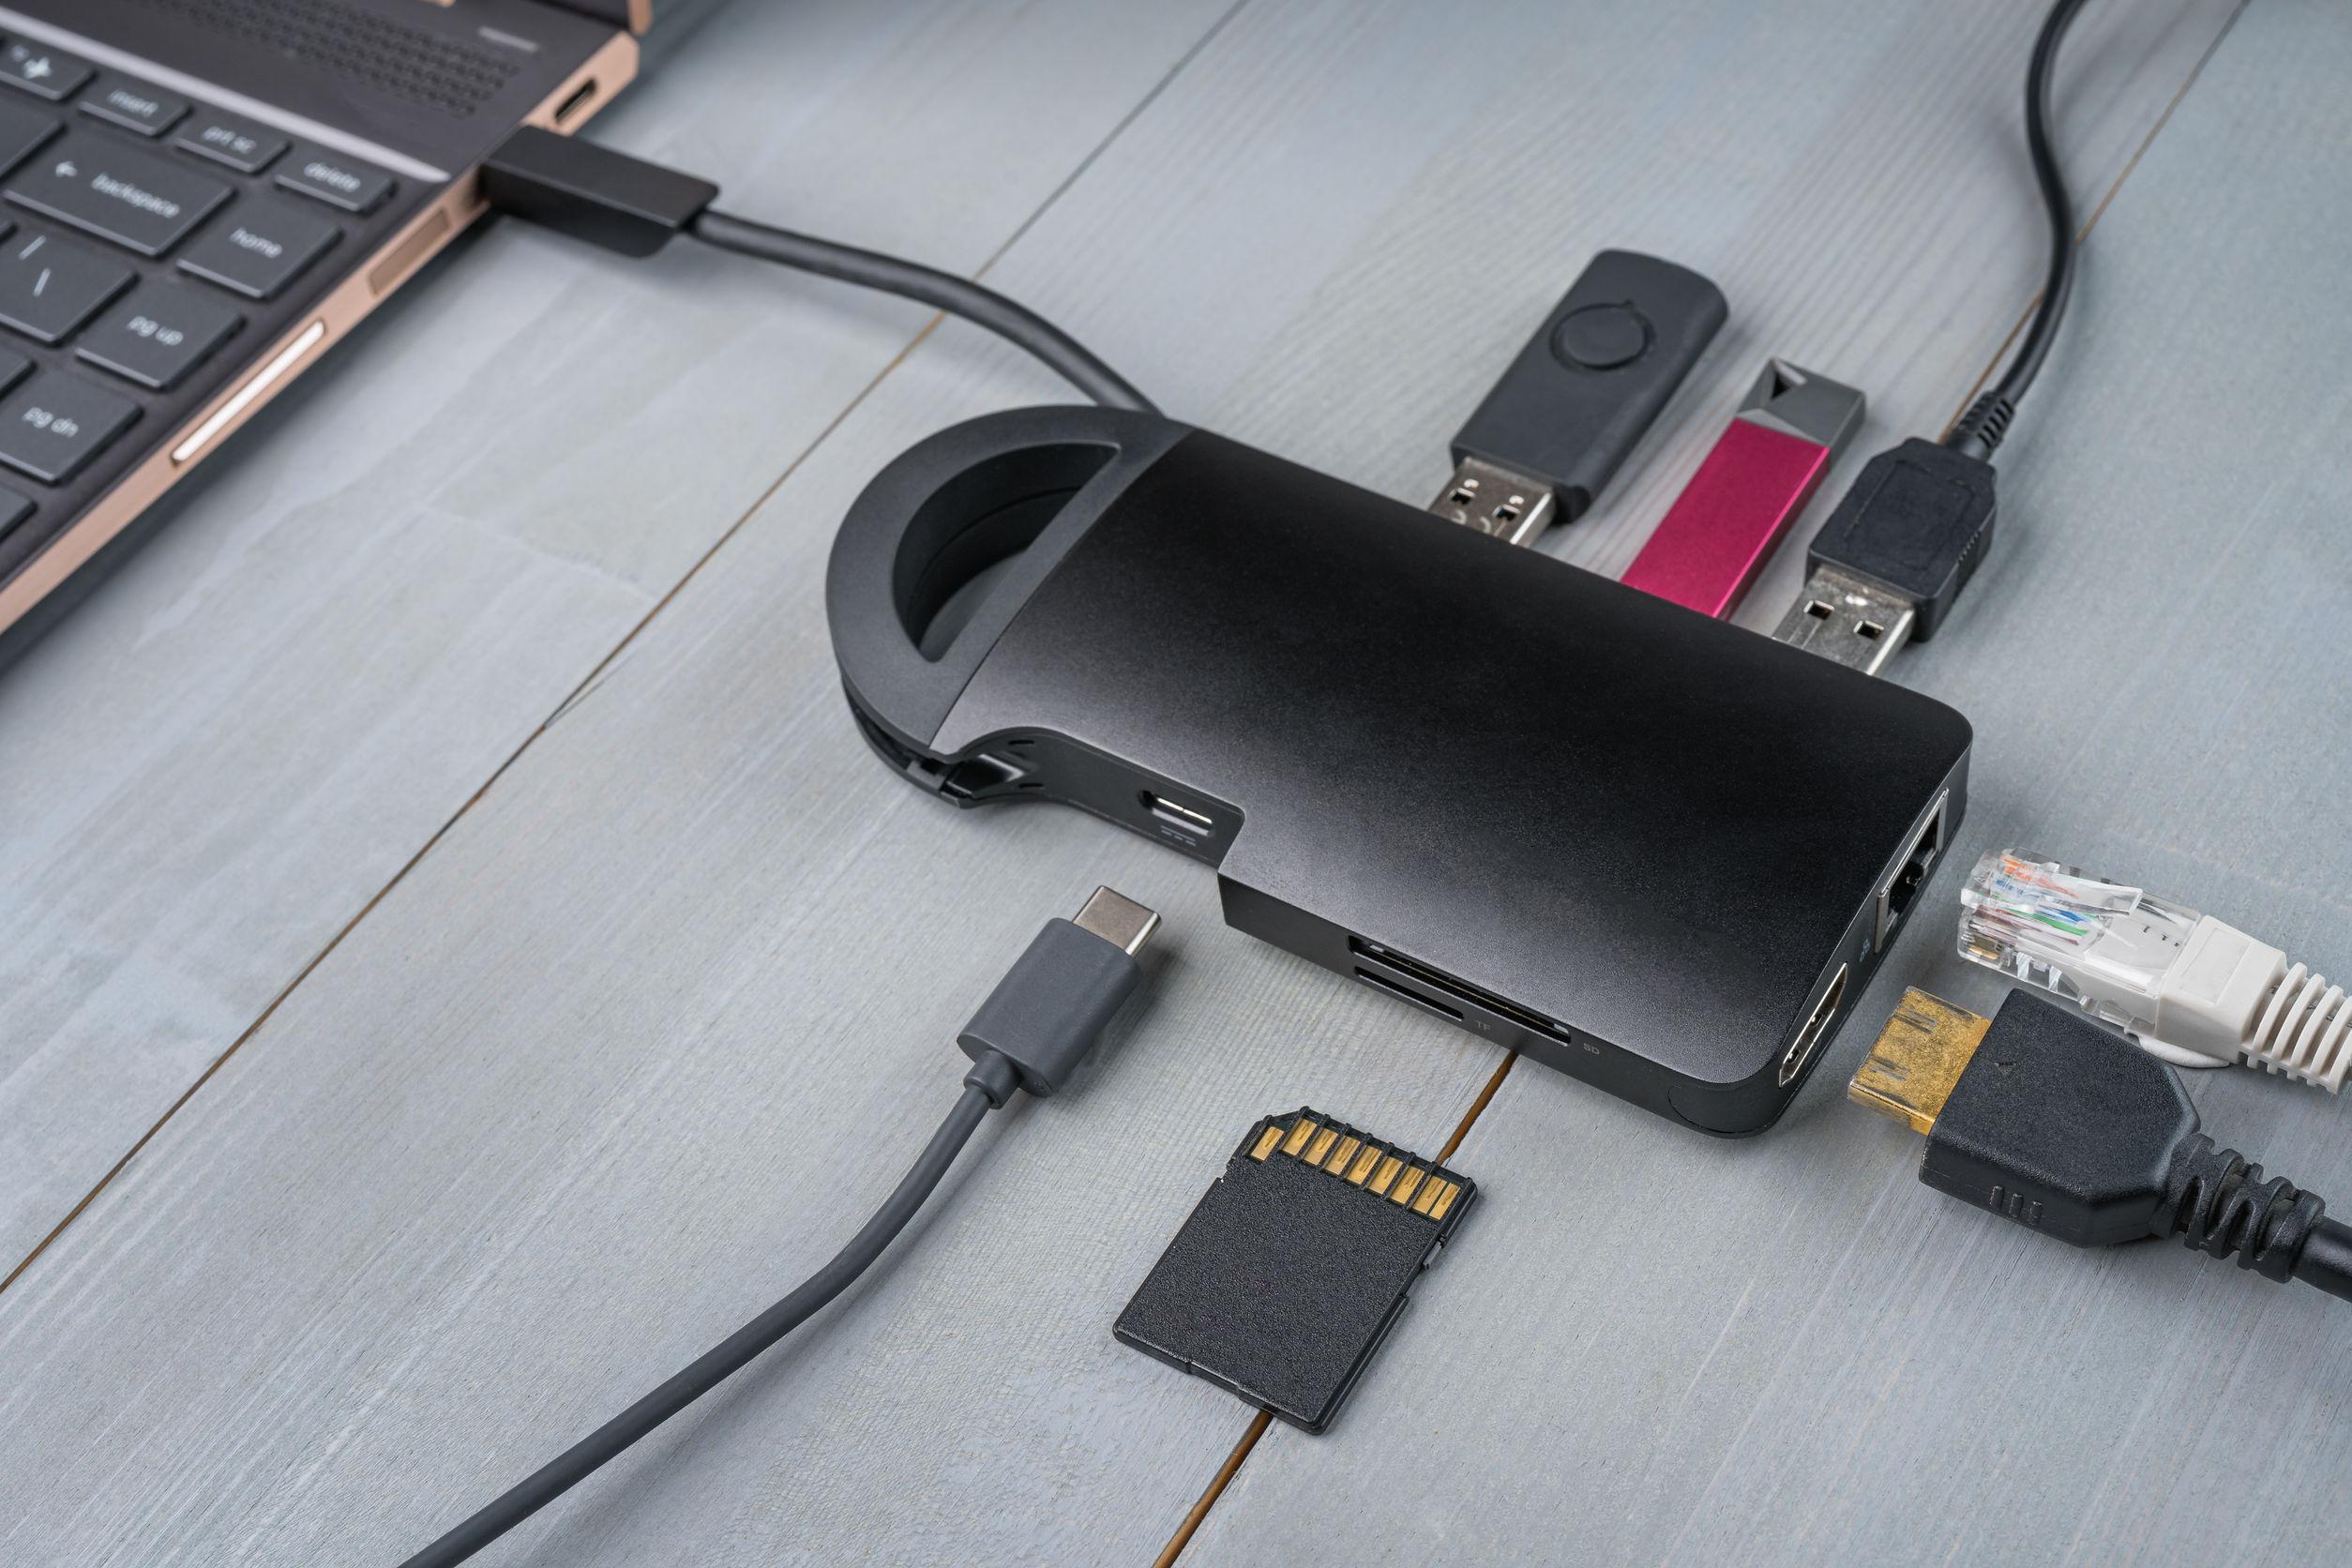 Adaptador o concentrador USB tipo C conectado a la computadora portátil con varios accesorios: pendrives, hdmi, ethernet, tarjeta de memoria, cables.